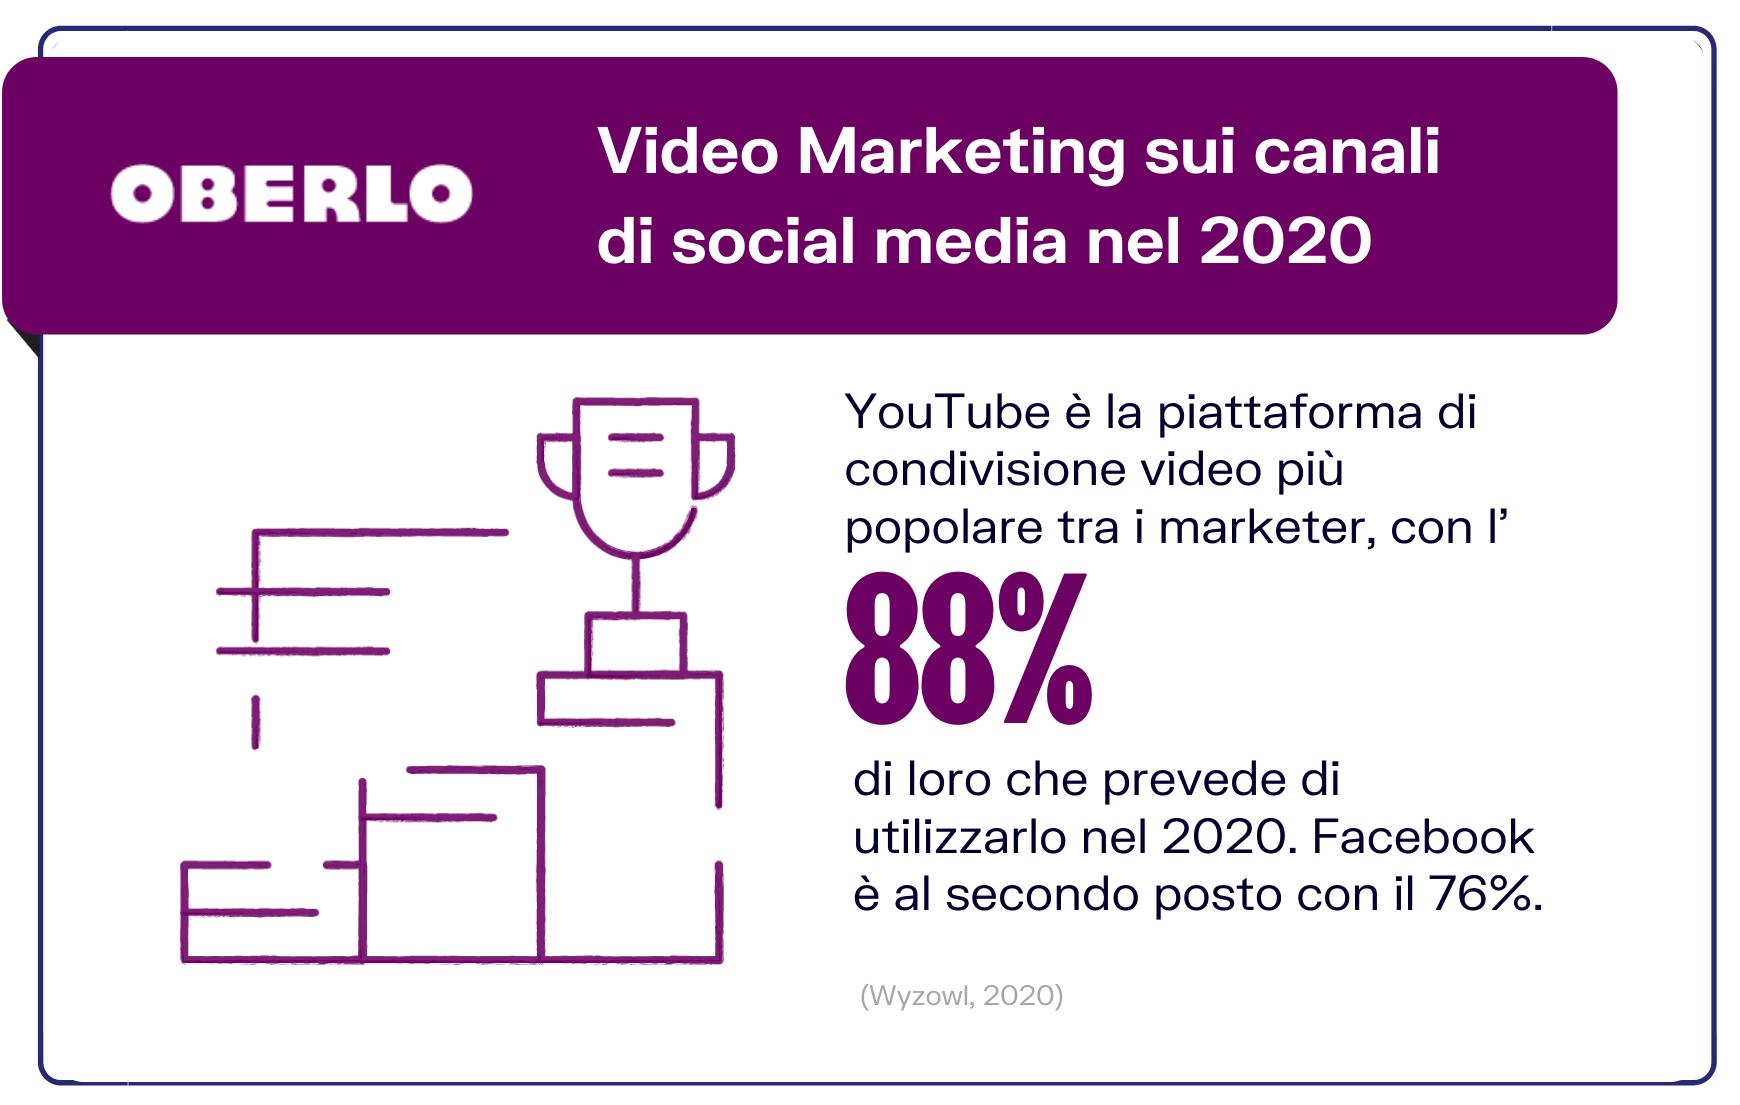 statistiche video marketing social media